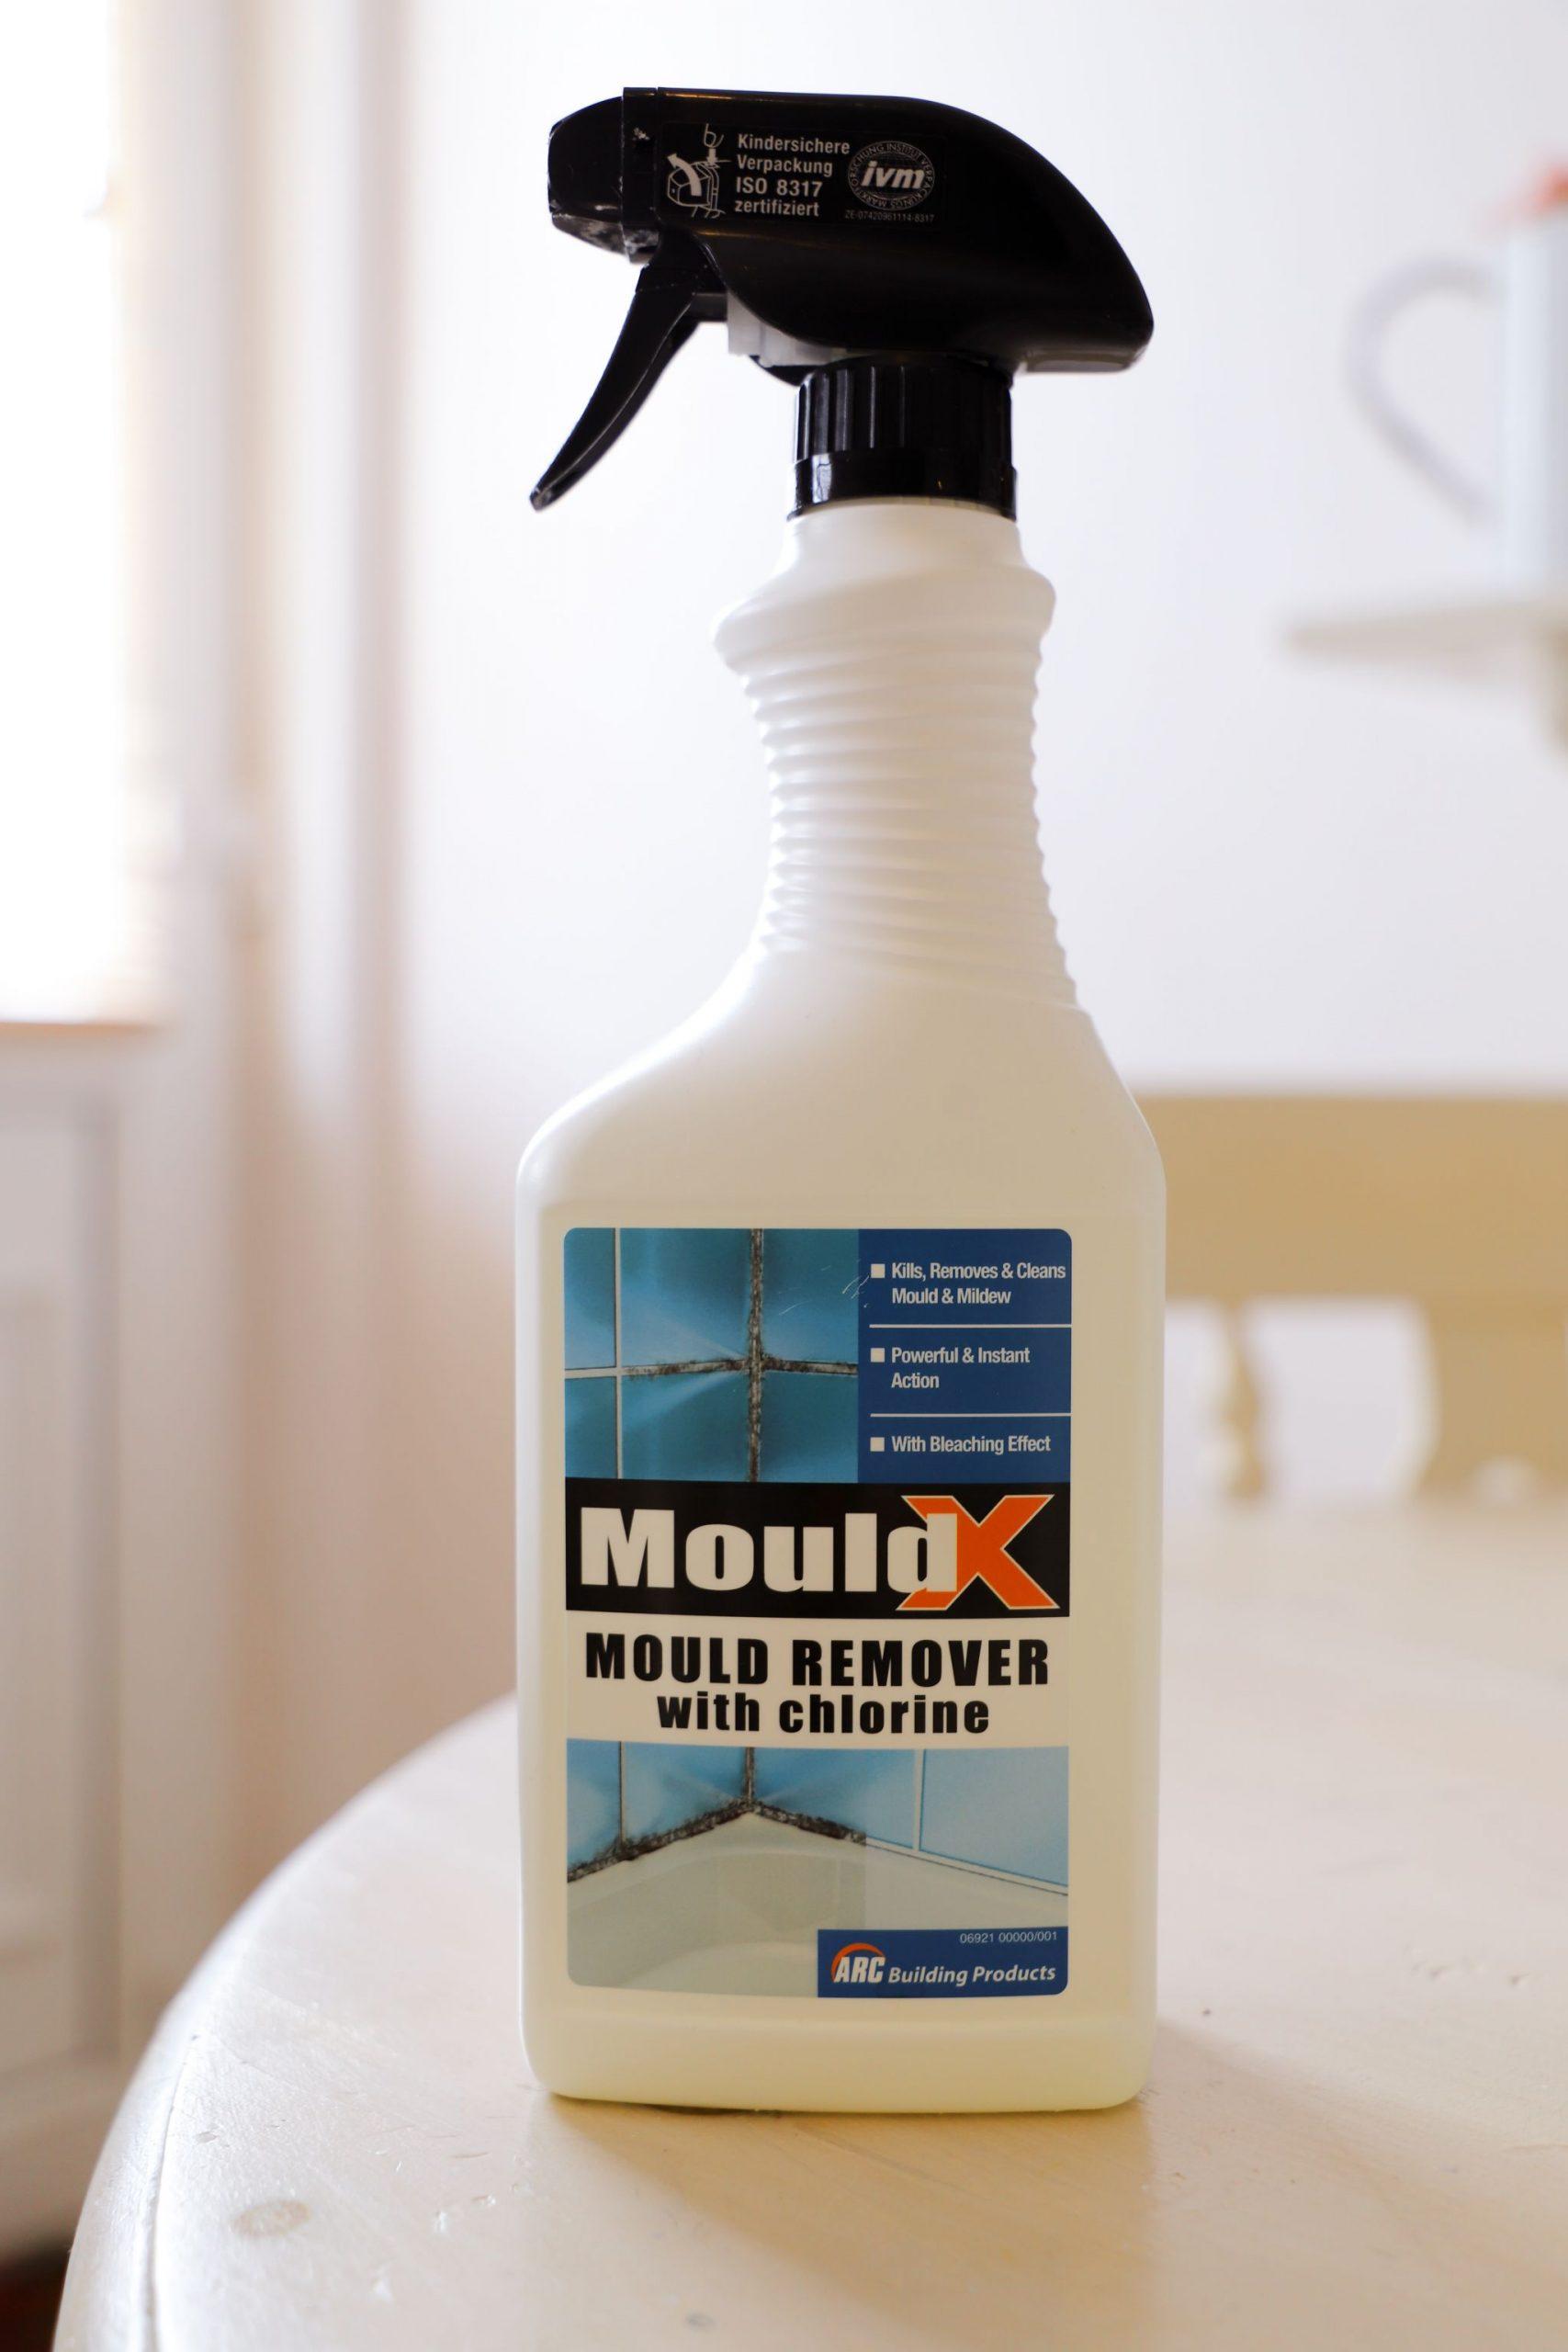 MouldX spray cleaner